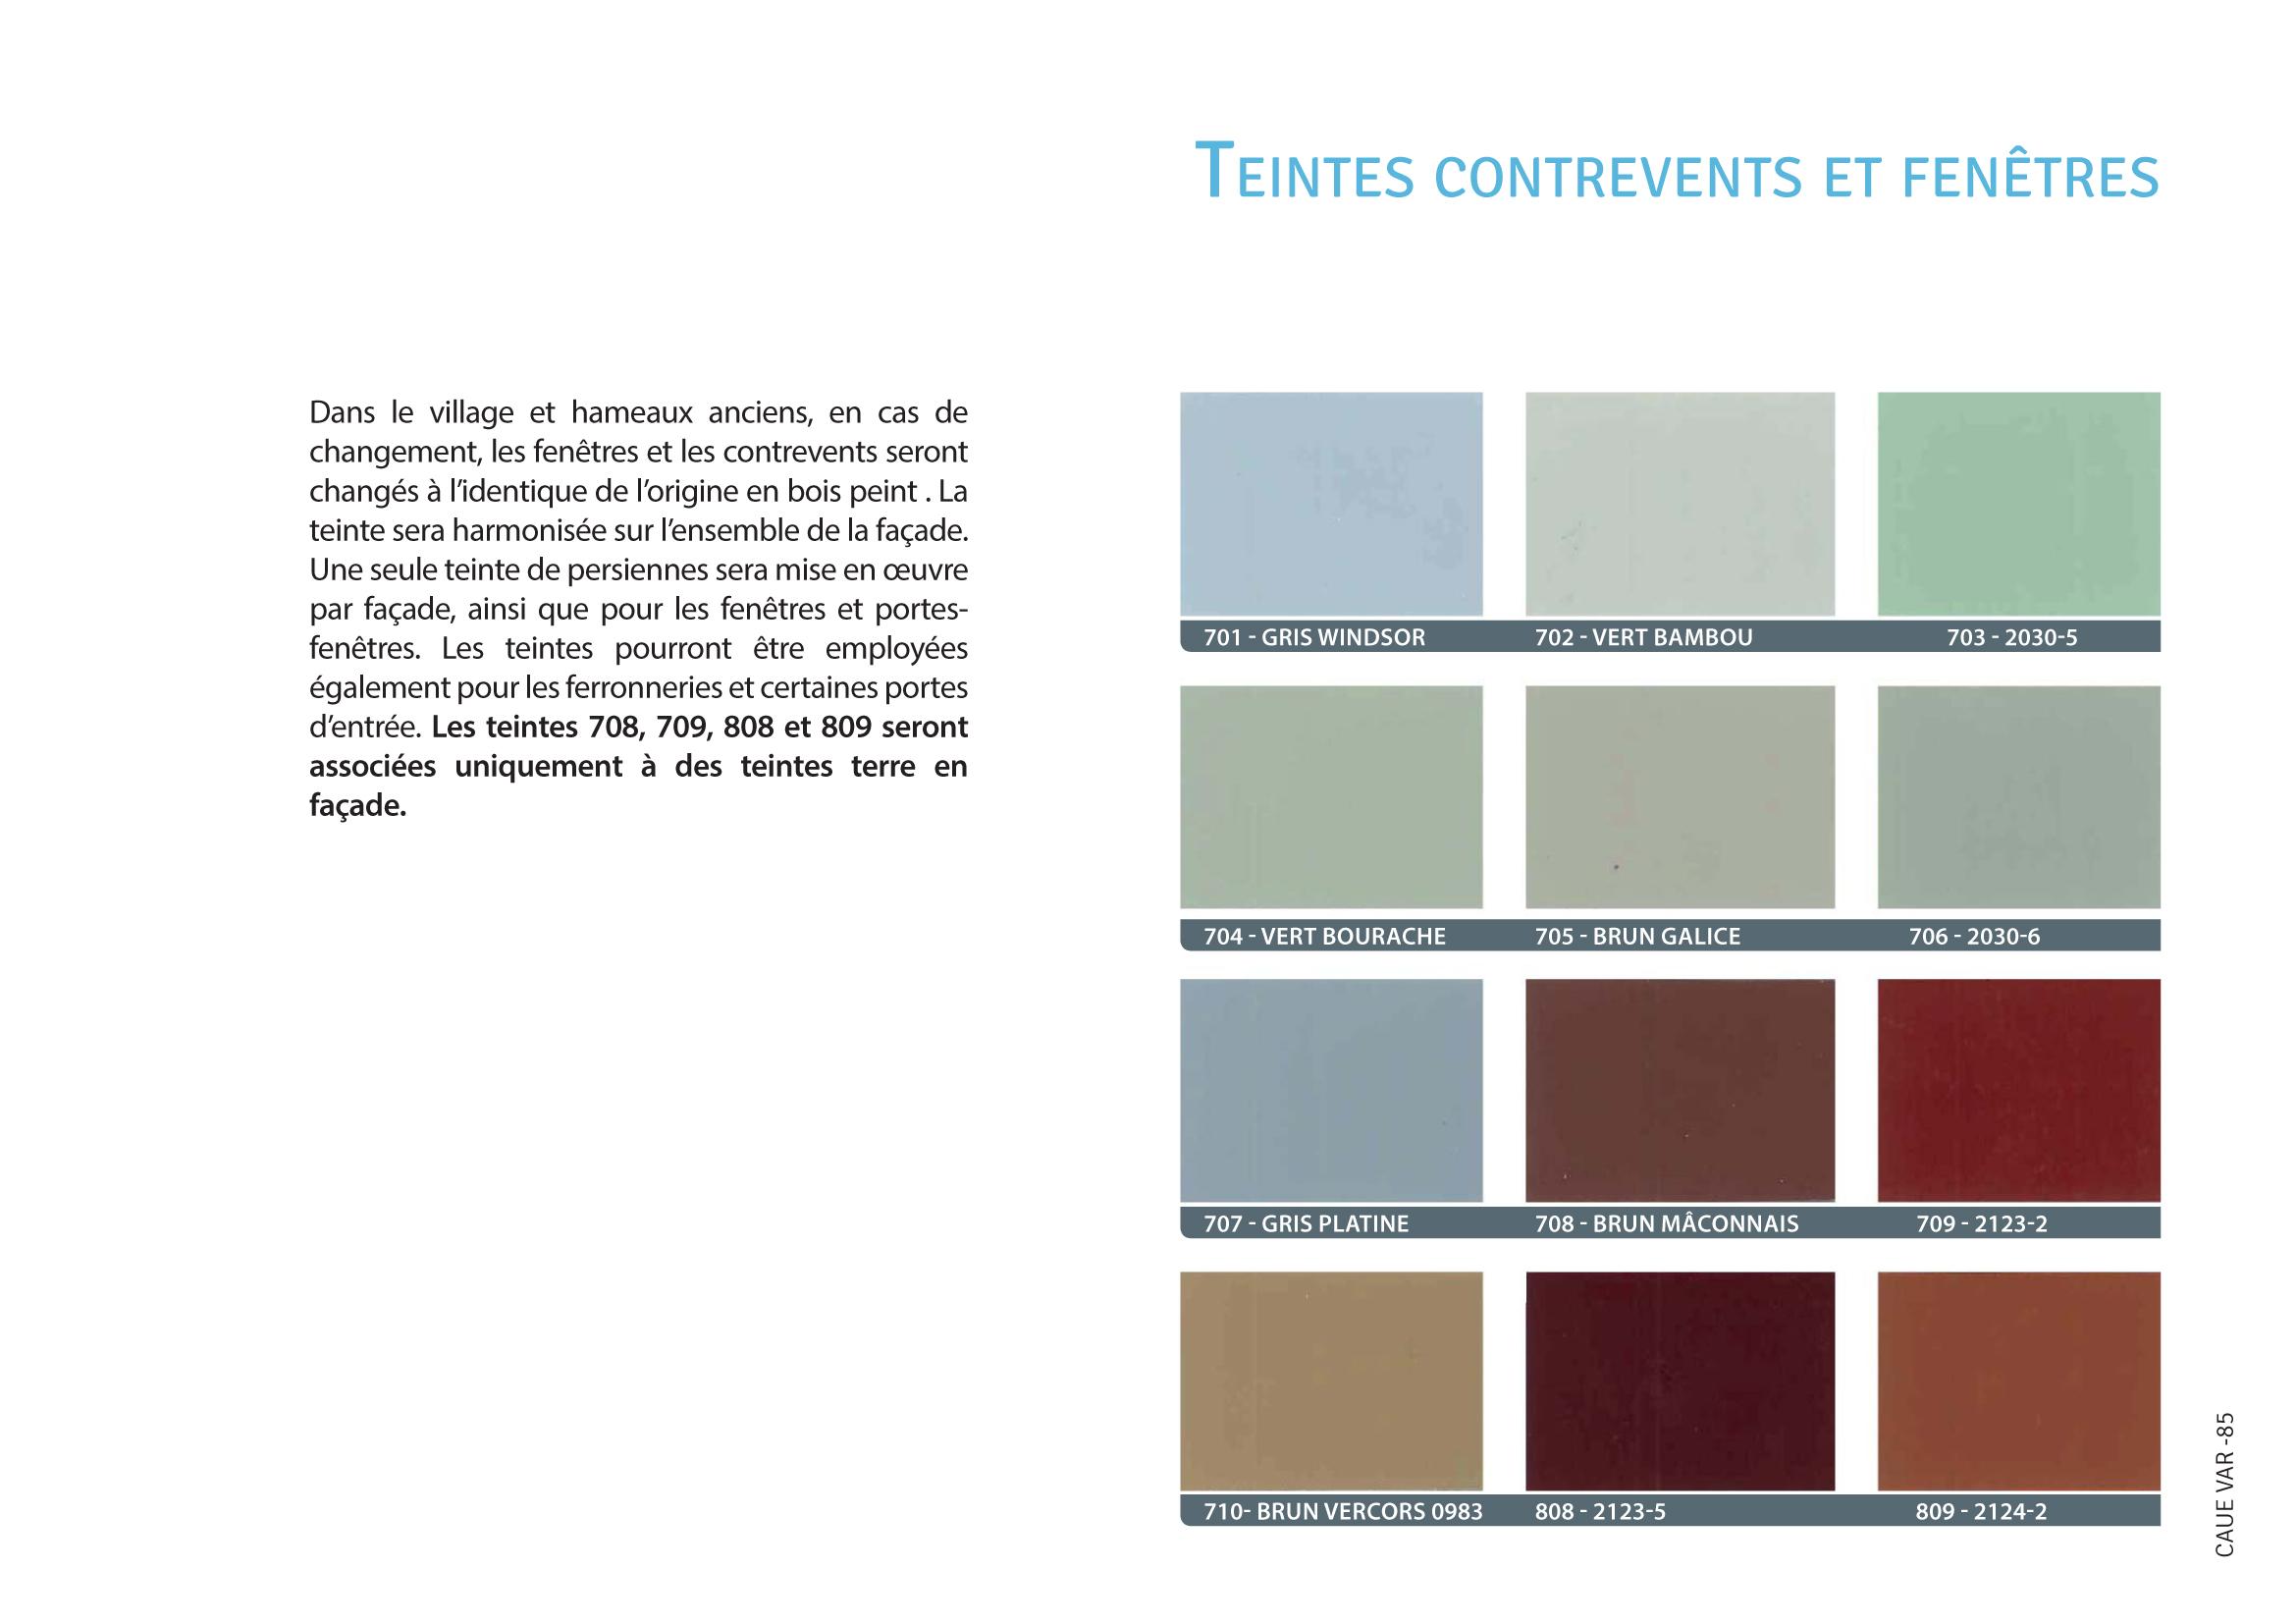 10_teintes_contrevents_et_fenetres-jpg